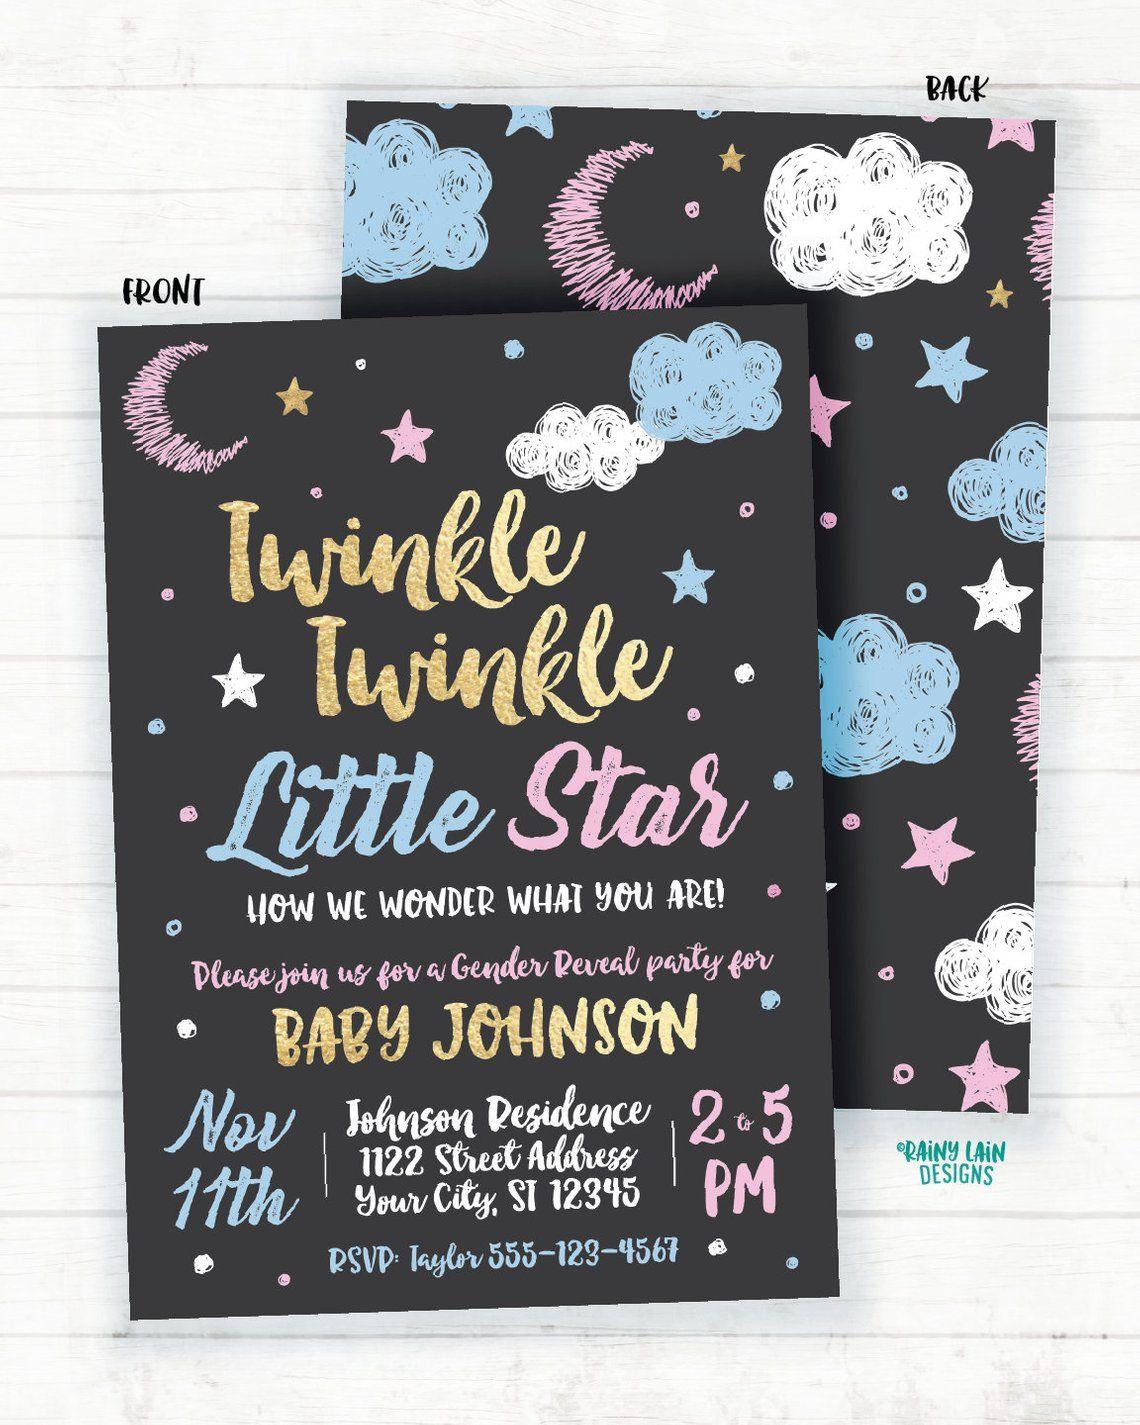 Twinkle Twinkle Little Star Gender Reveal Invitation Chalkboard Twinkle Twinkle Little Star Gender Reveal Invite Blue Pink Gold Moon Clouds In 2021 Gender Reveal Invitations Gender Reveal Invitations Template Gender Reveal